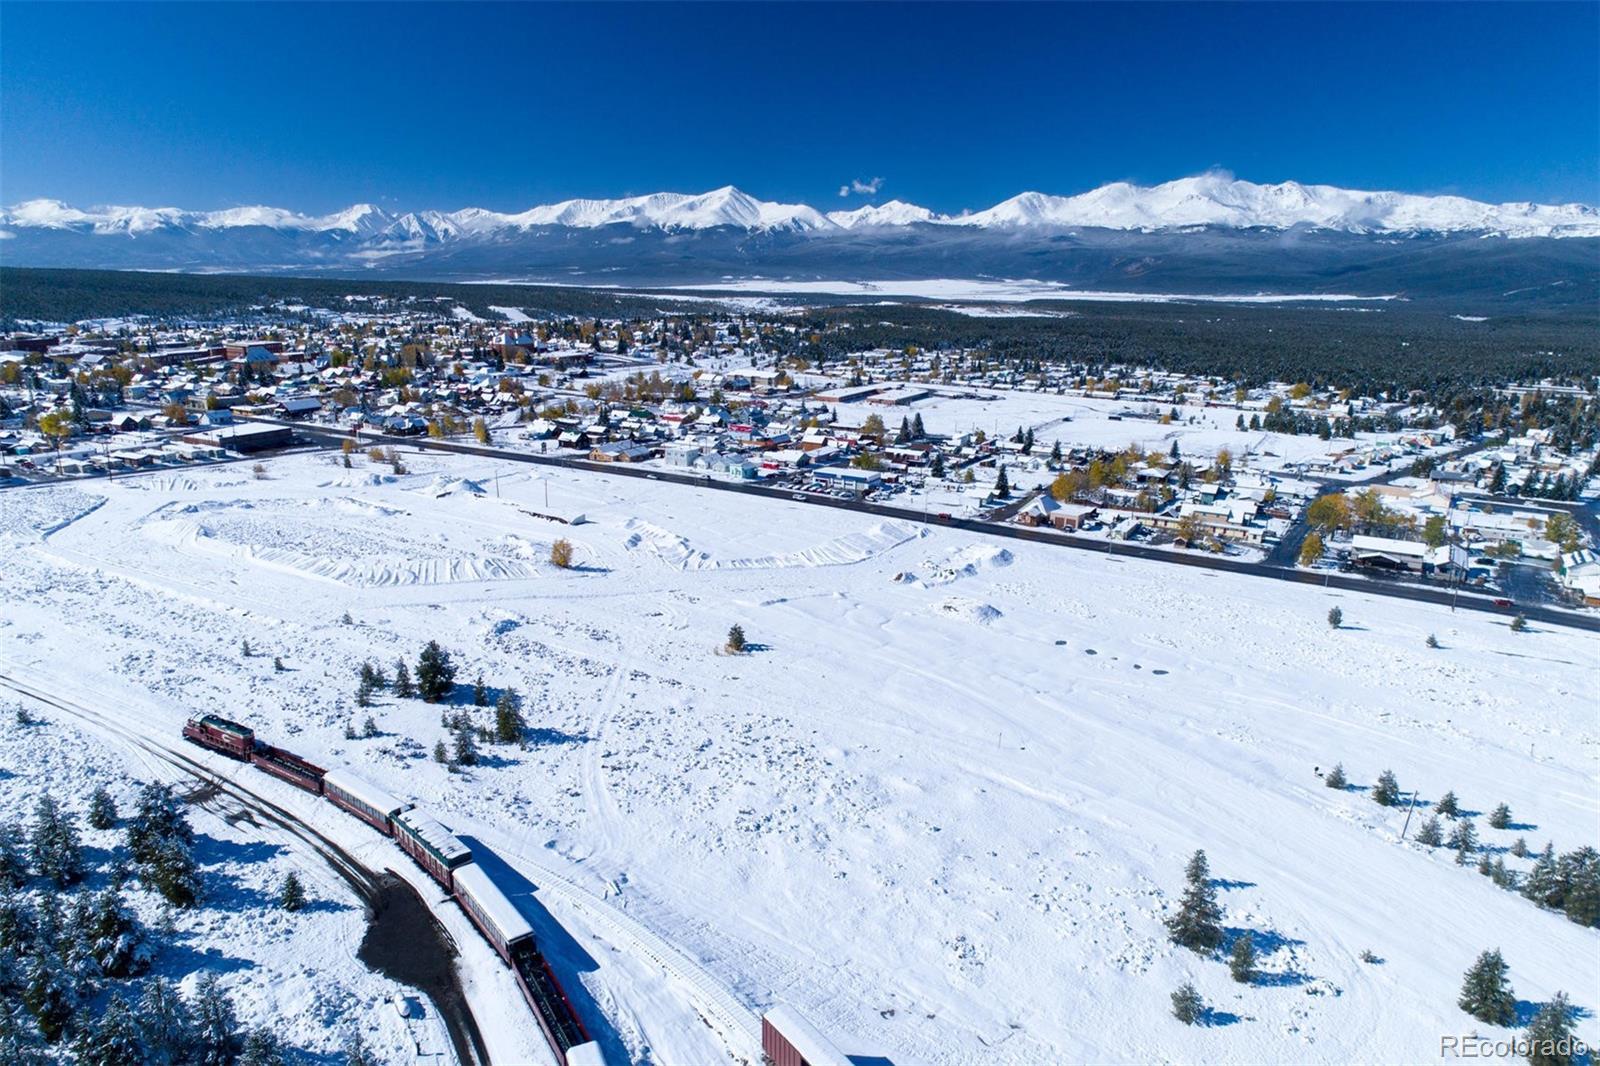 209 E Mountain View Drive, Leadville, CO 80461 - Leadville, CO real estate listing